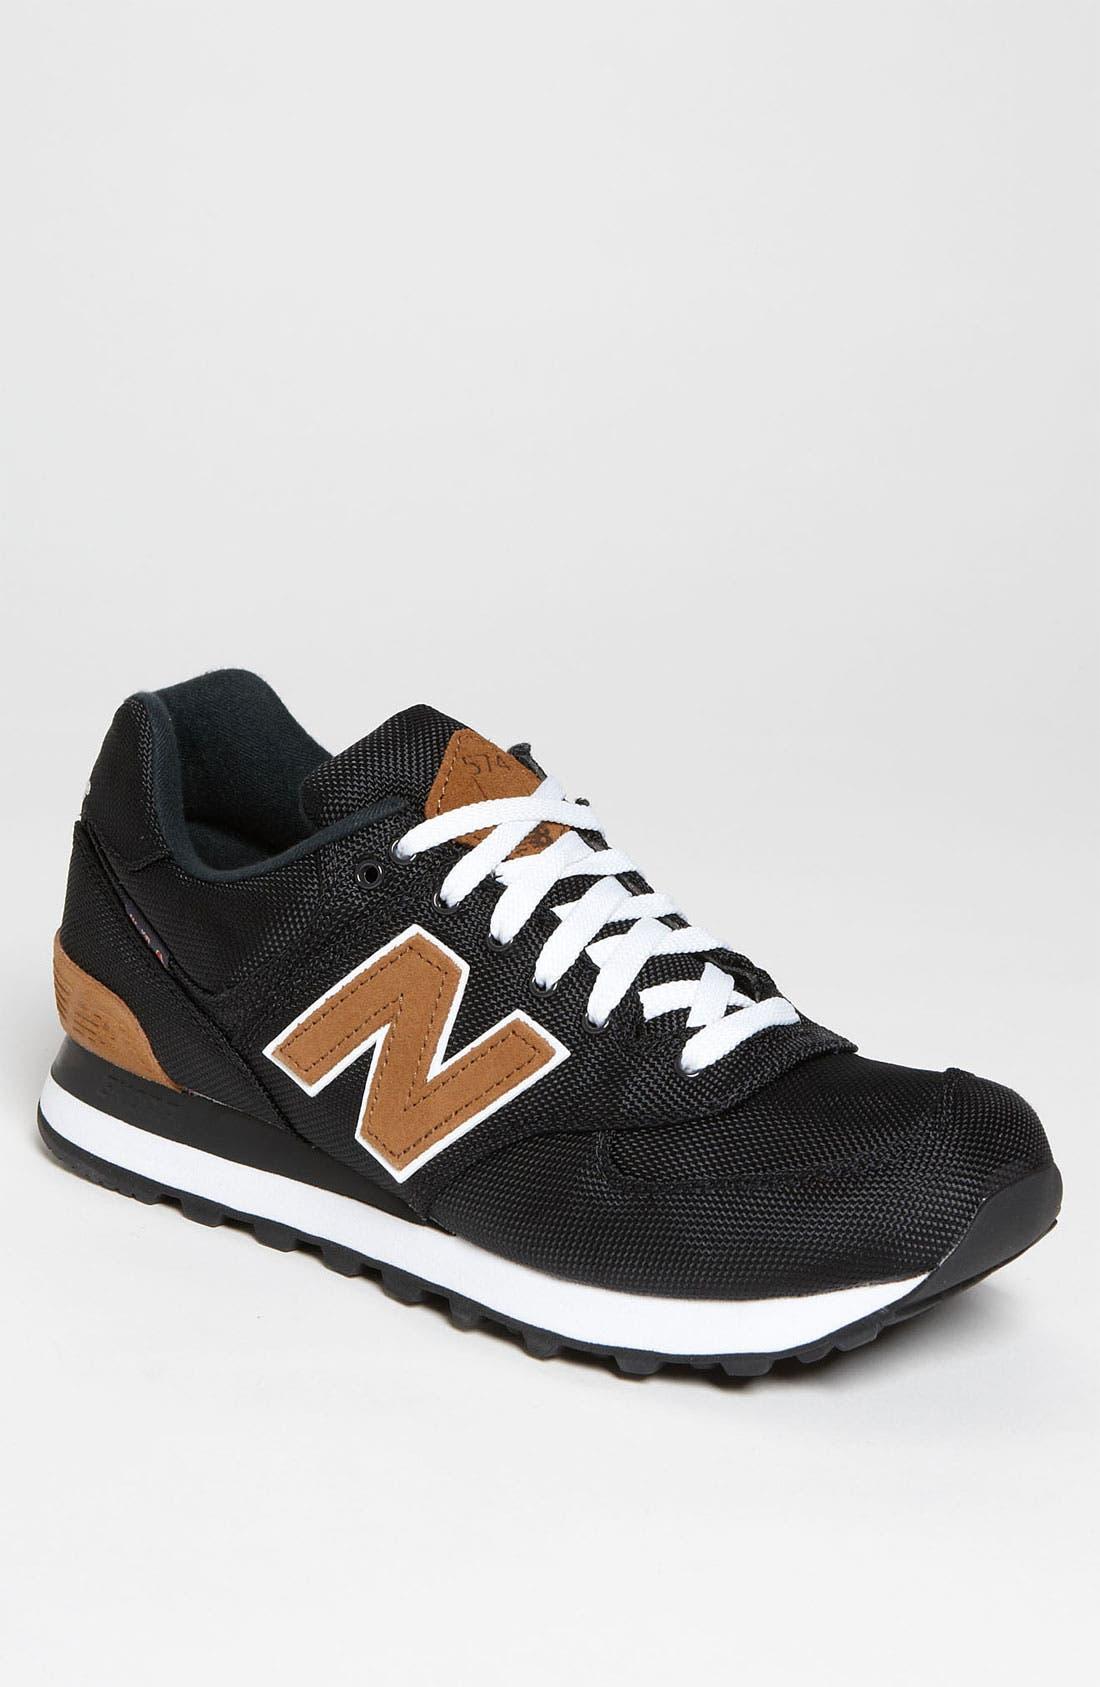 Main Image - New Balance '574 Backpack' Sneaker (Men)